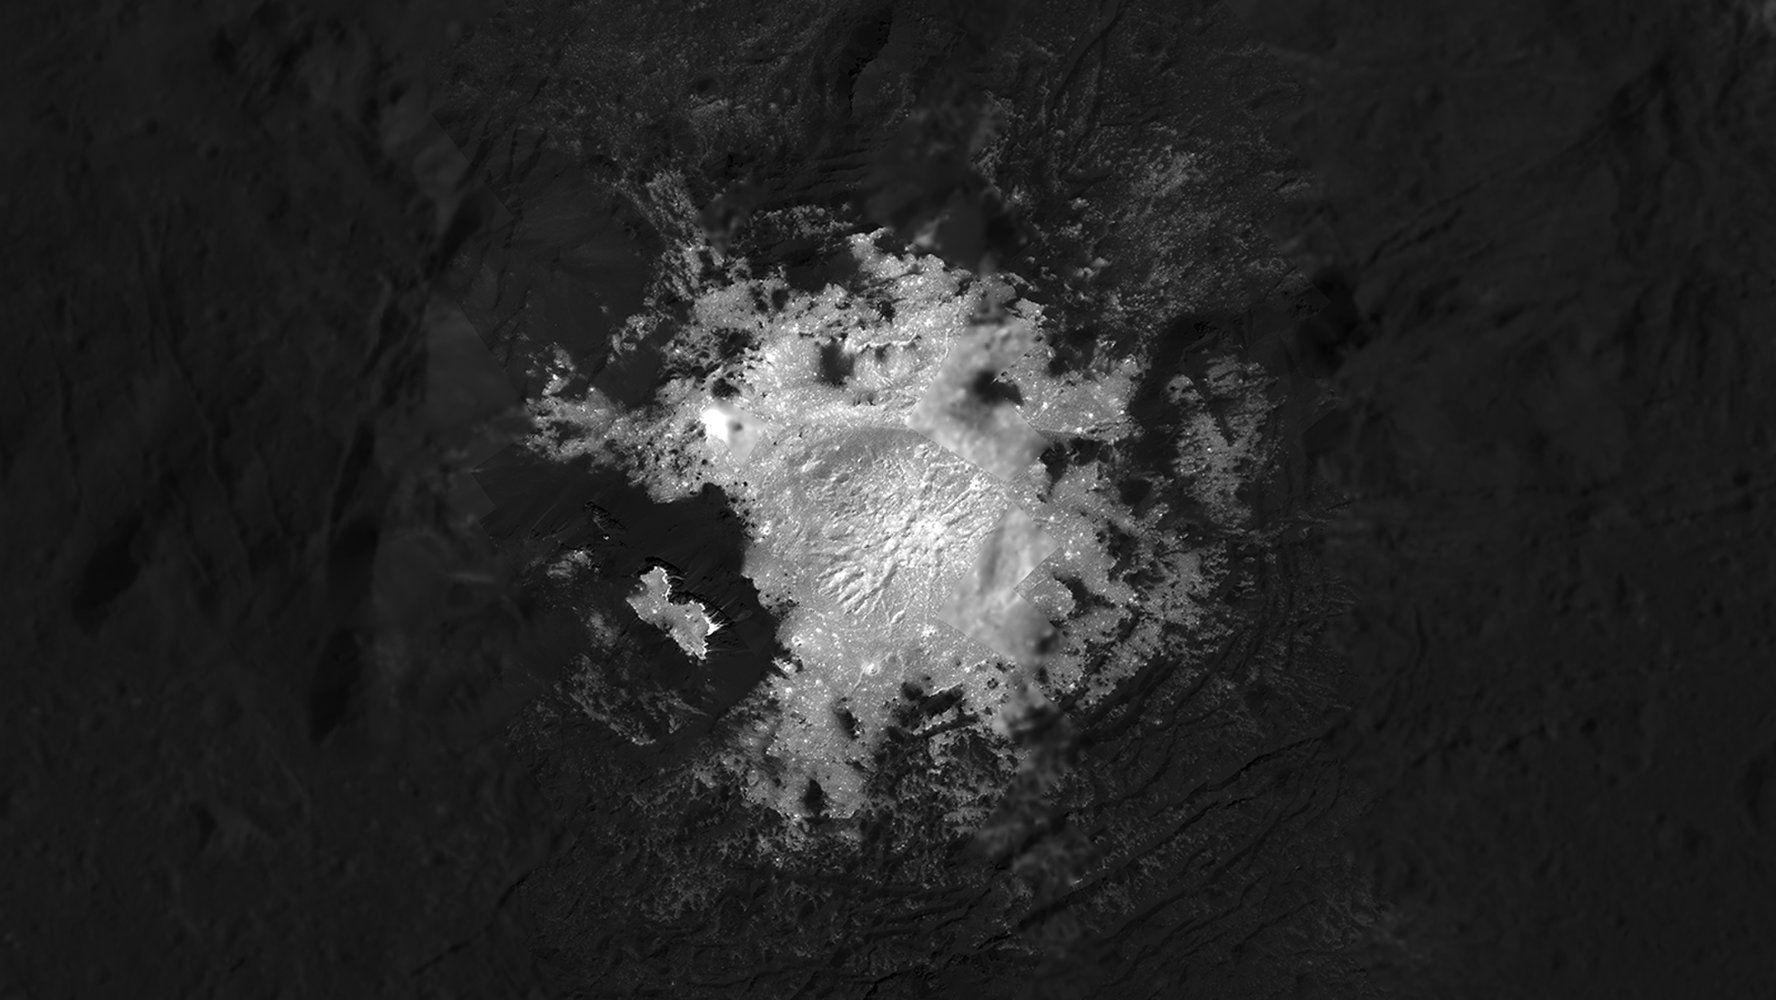 Dwarf ceres bizarre bright spots shine in stunning